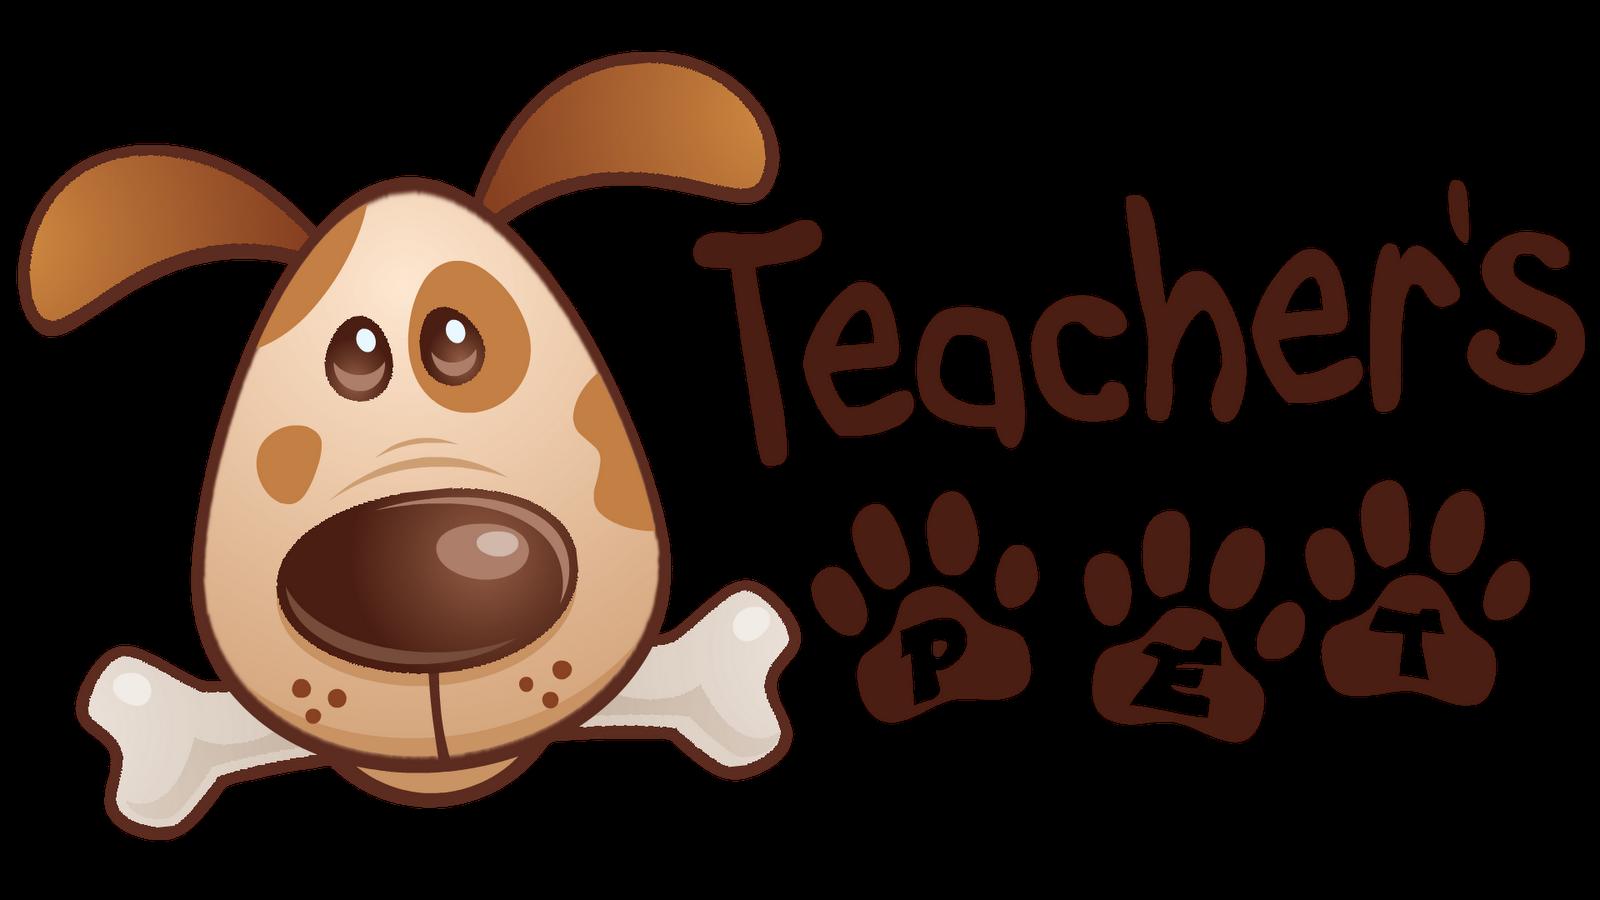 Ready steady smile and. Clipart teacher pet